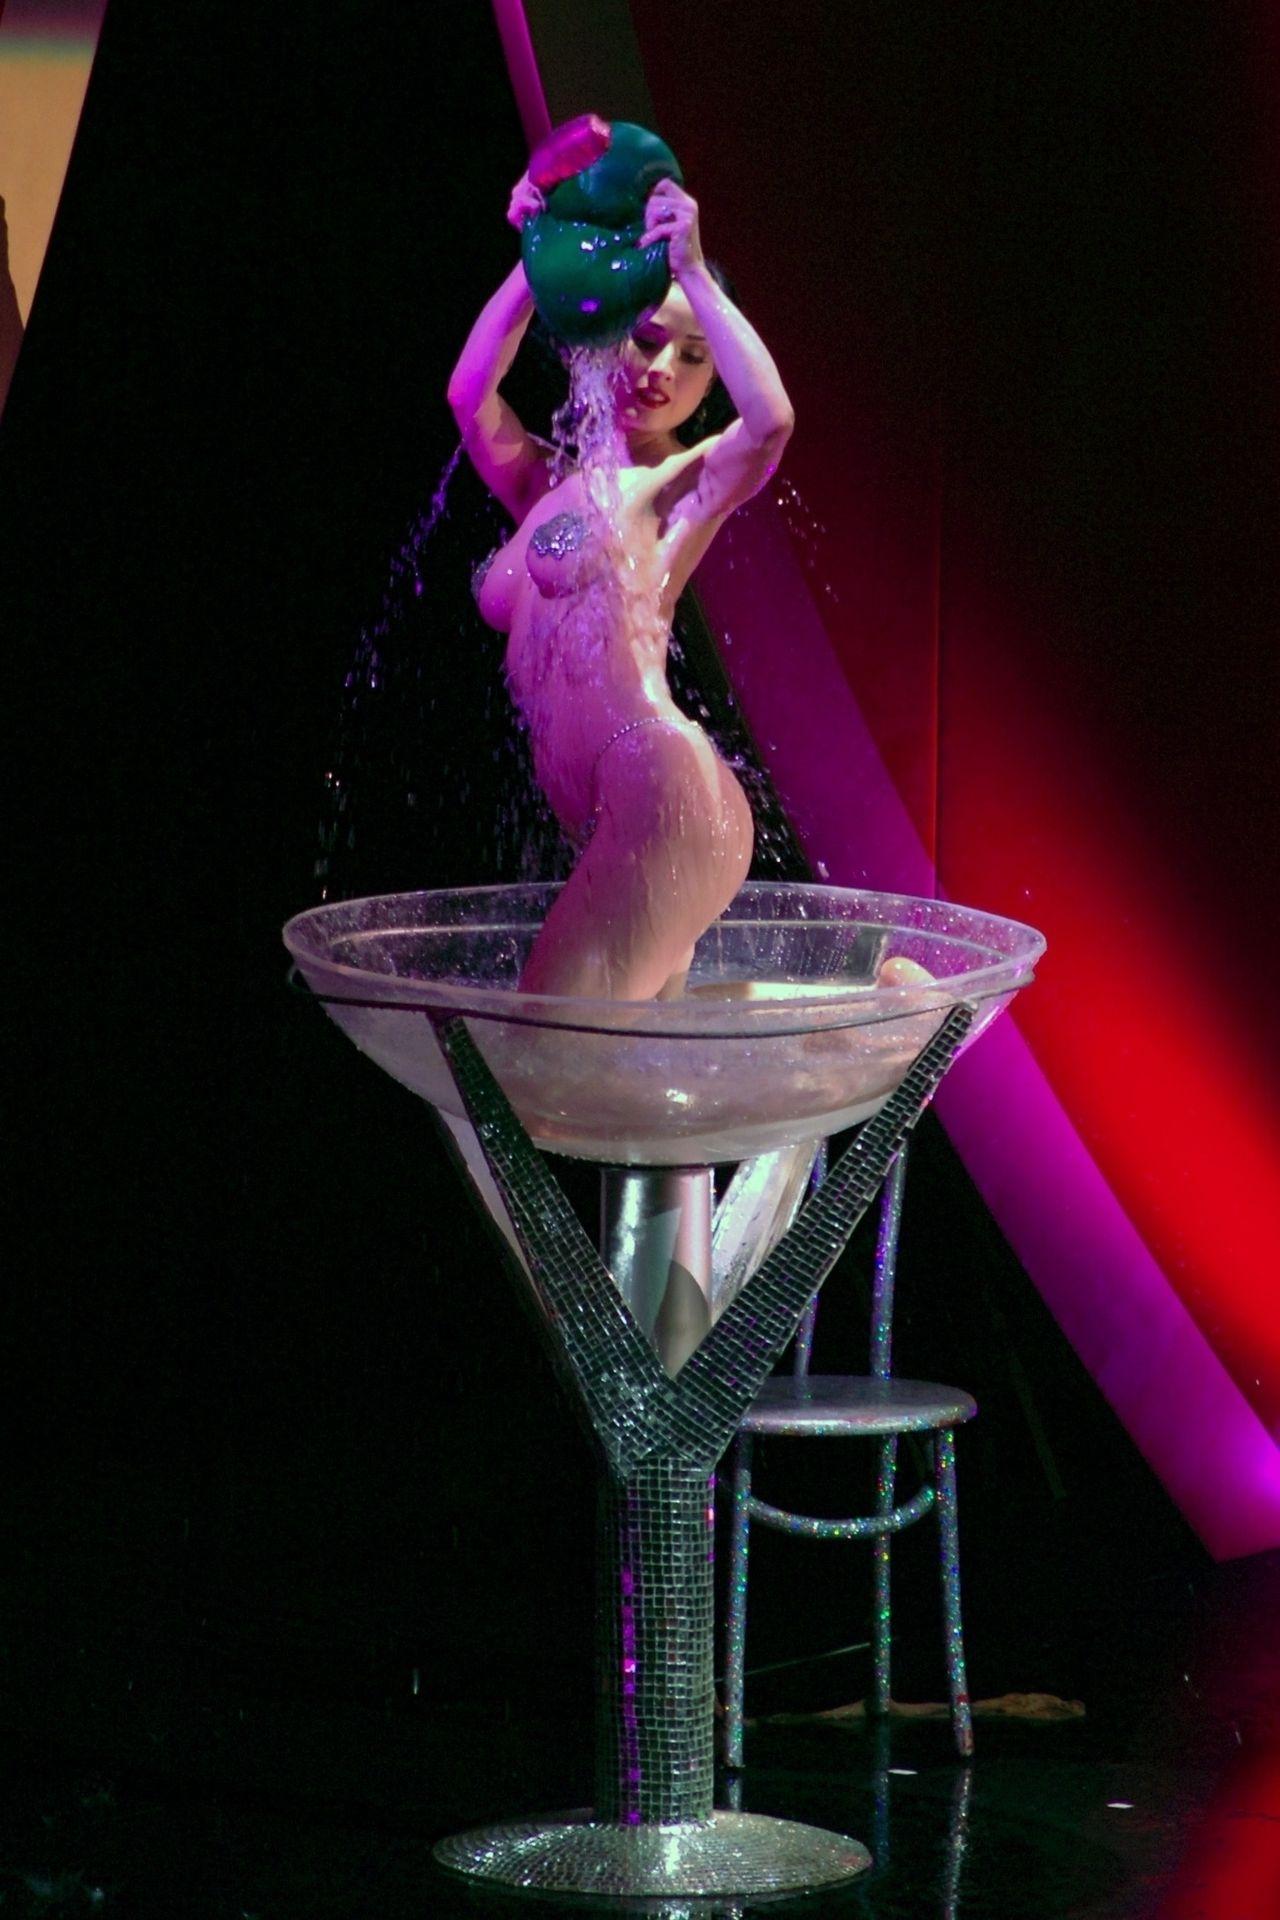 Dita Von Teese Performs At Erotica 06 In London 0042